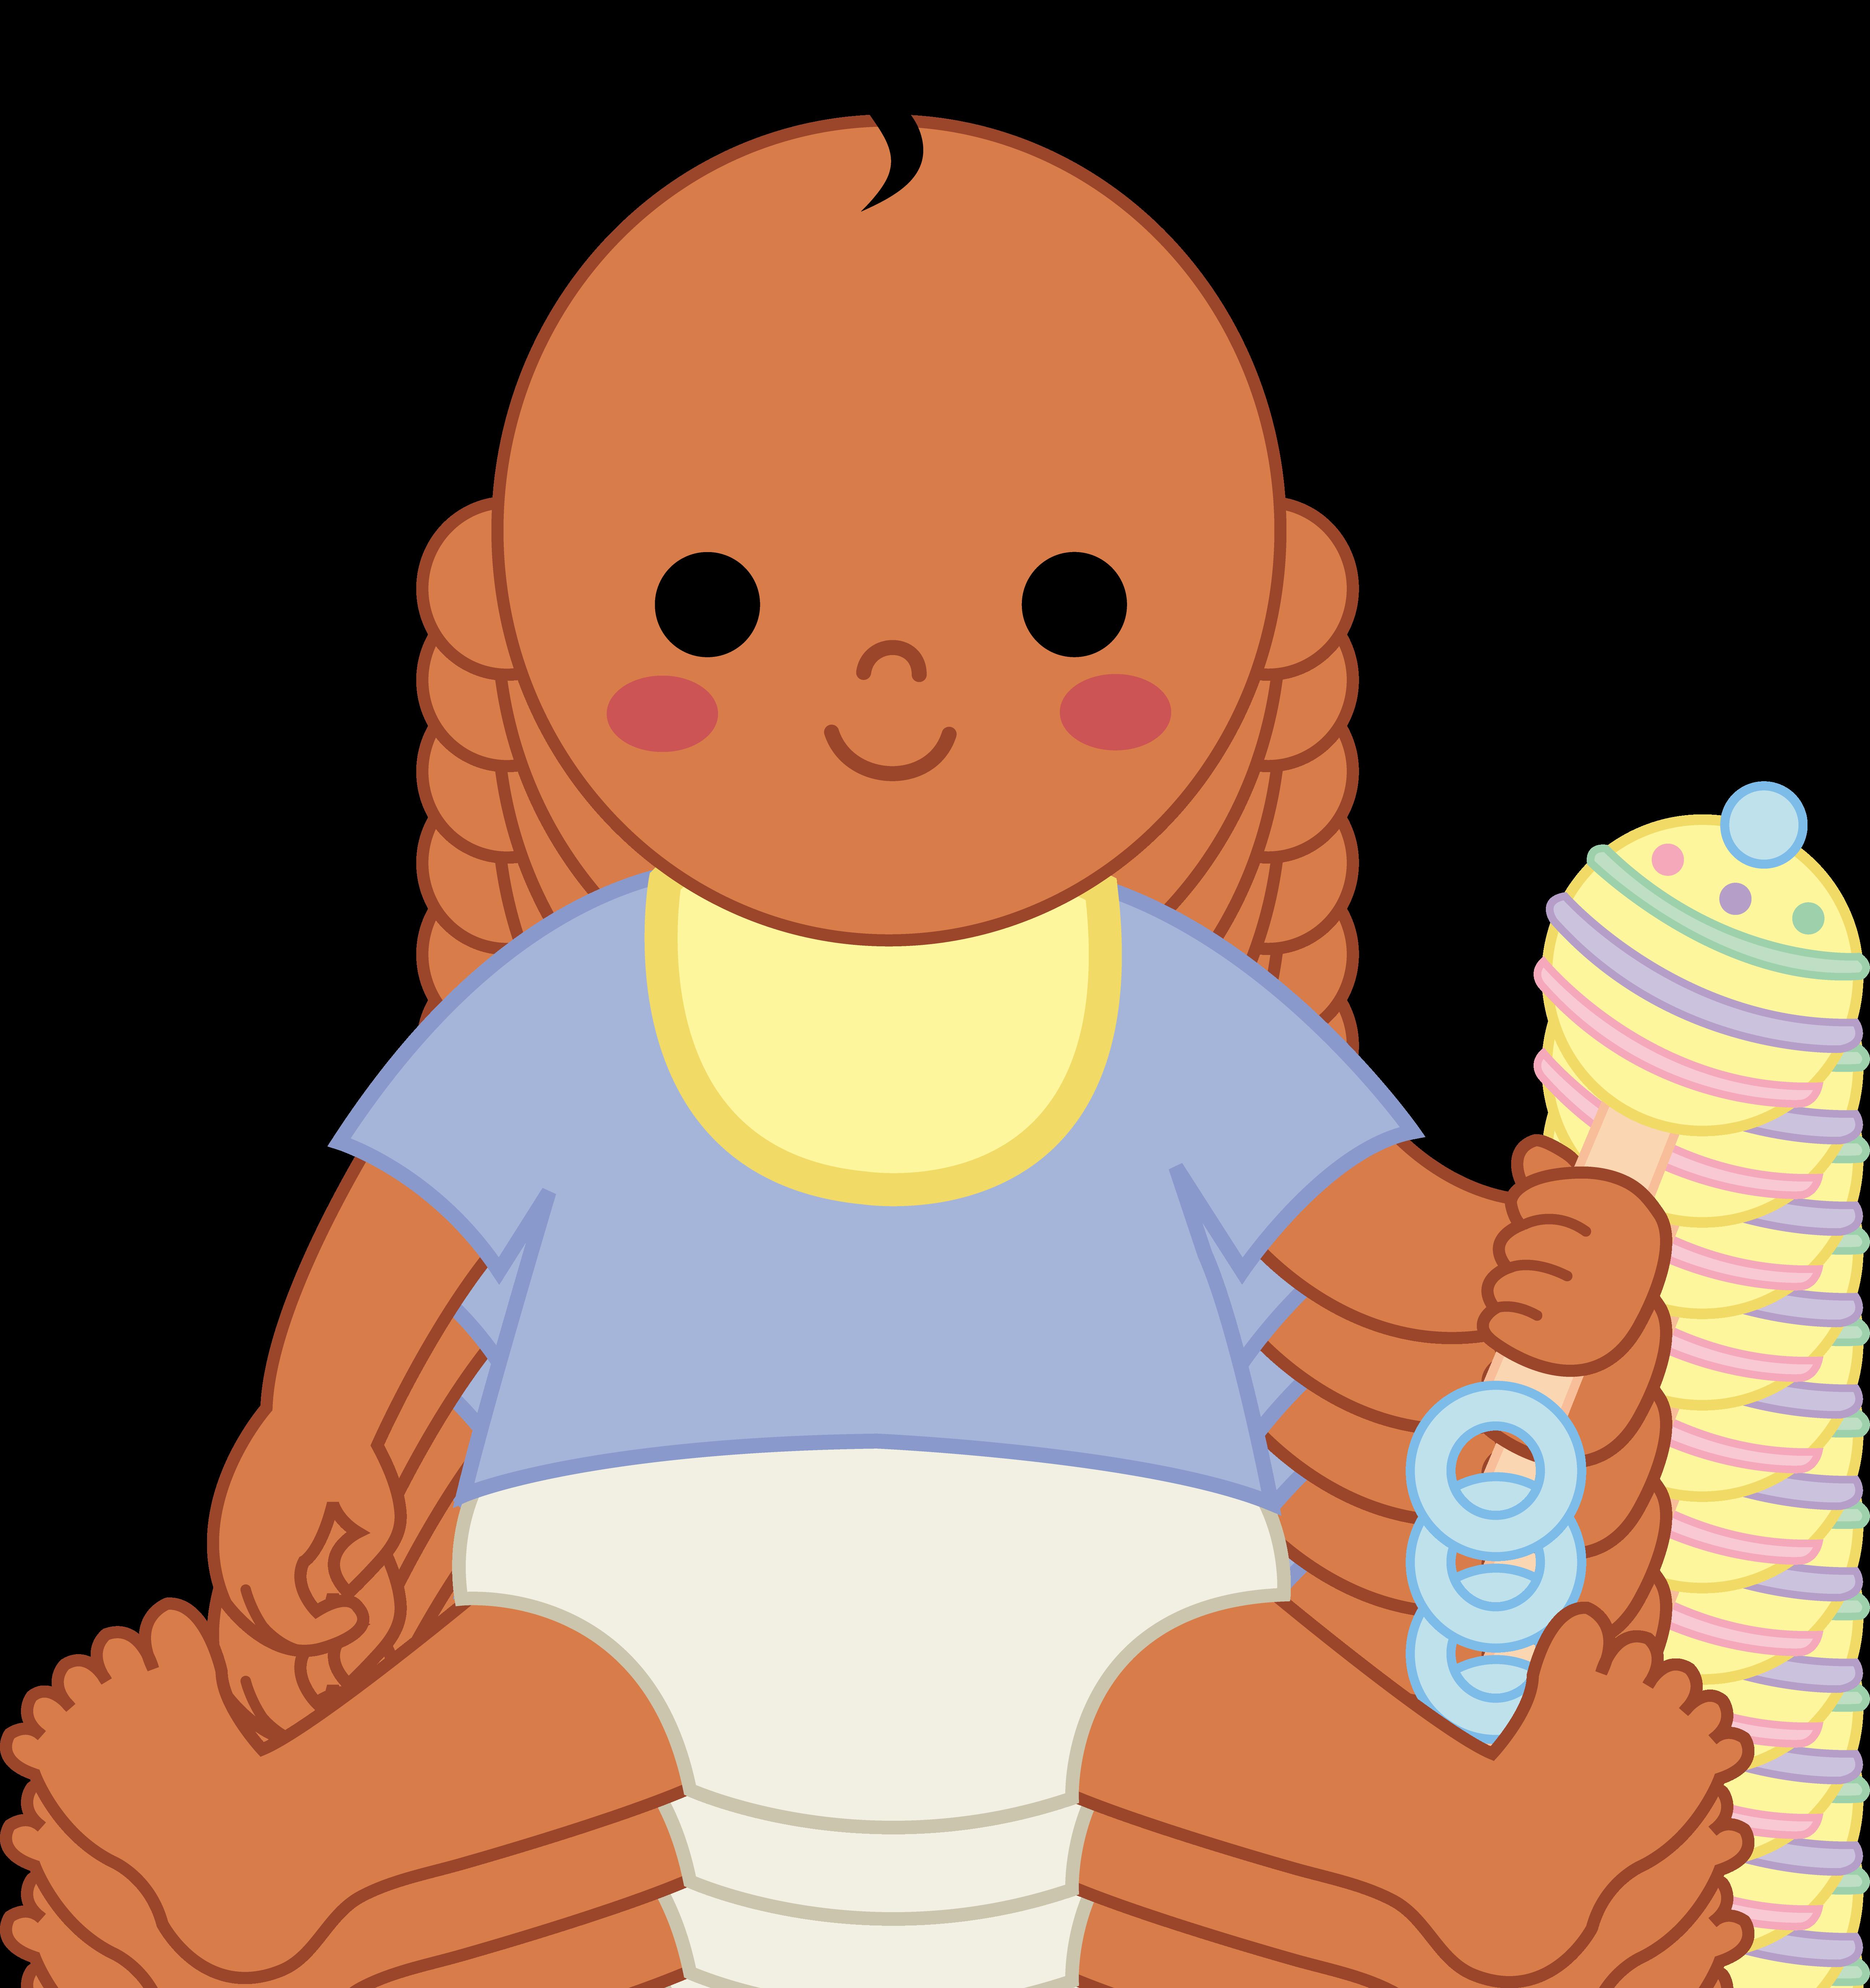 5175x5502 Baby Boy Clip Art Baby Clipart Image 2 5